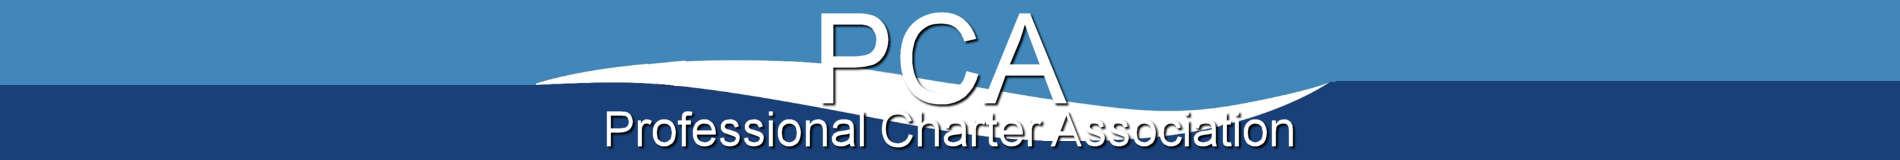 PCA-logo-head